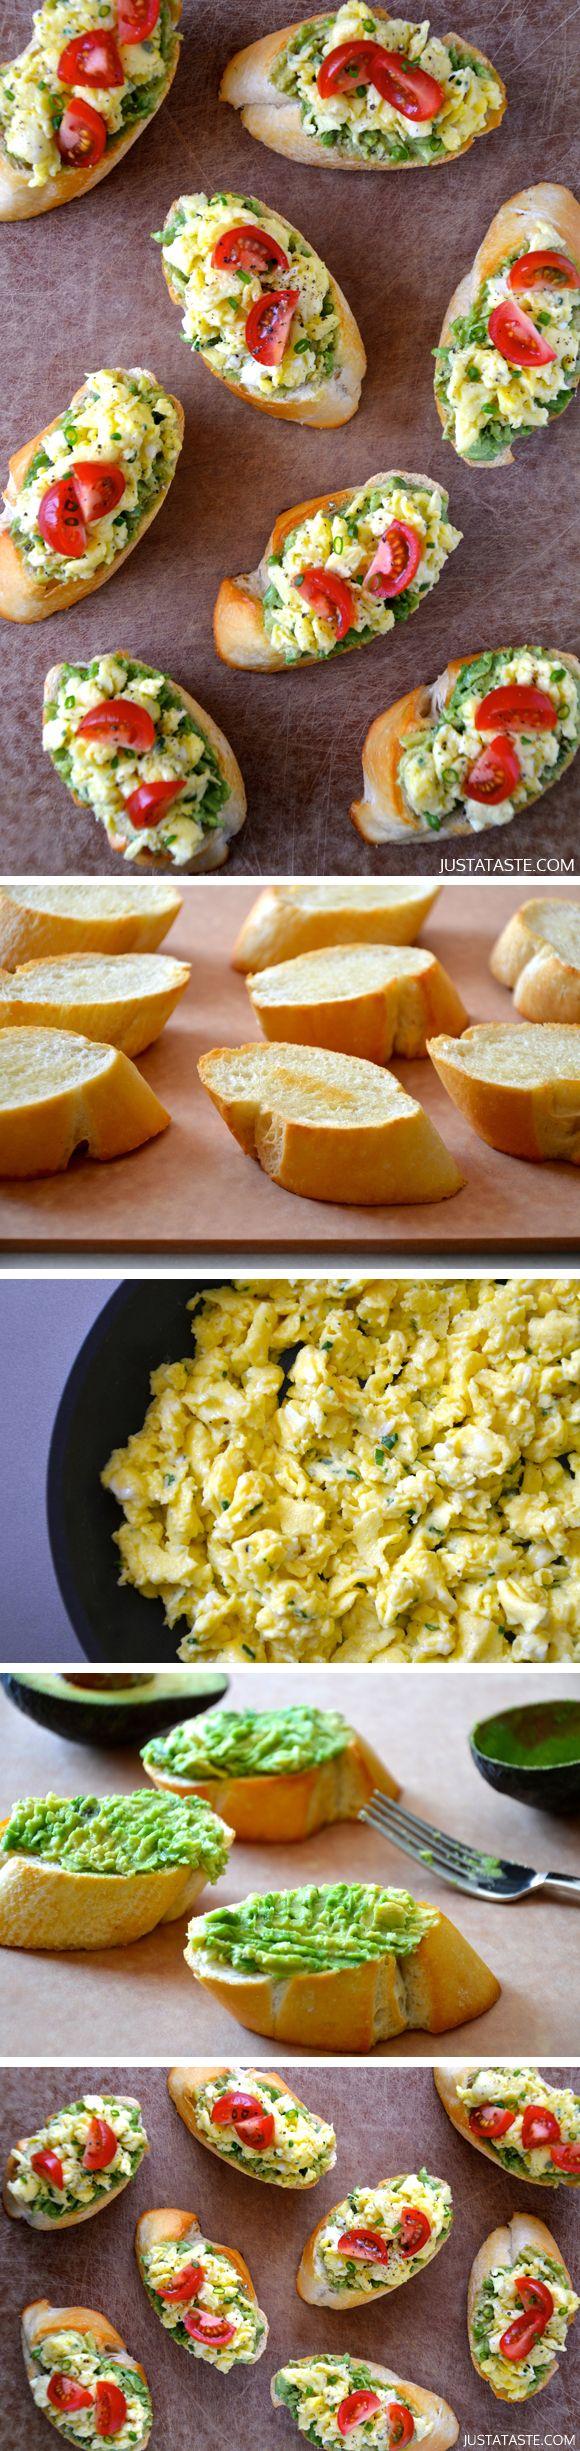 Quick and Easy Breakfast Bruschetta by justataste #Breakfast#Bruschetta #Easy